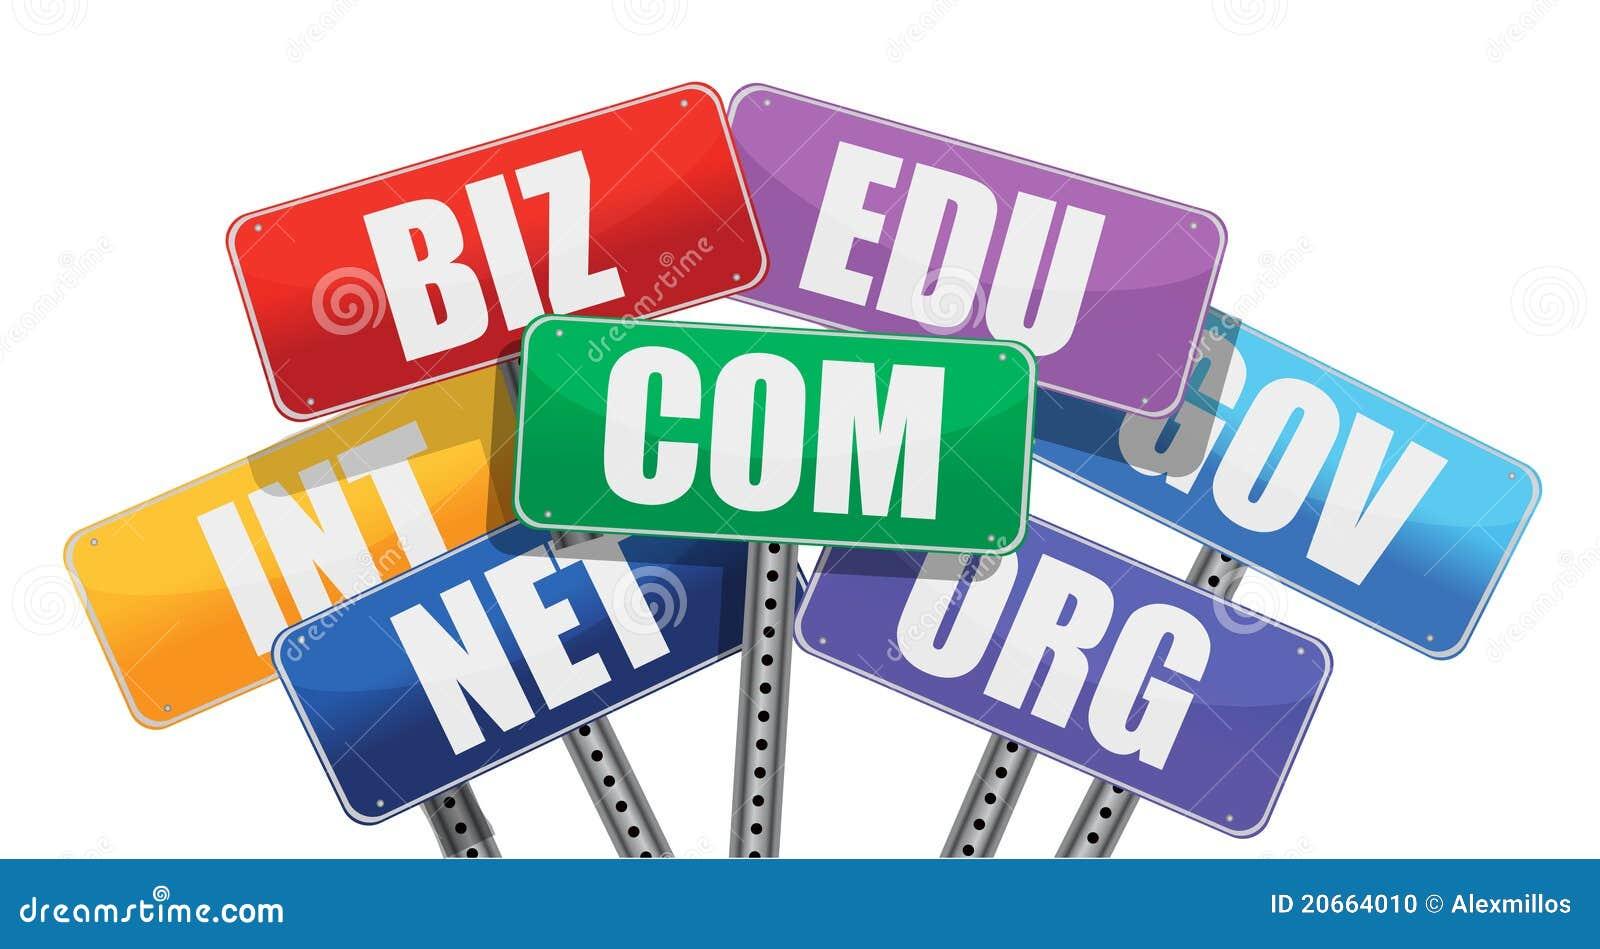 Domain names signs internet